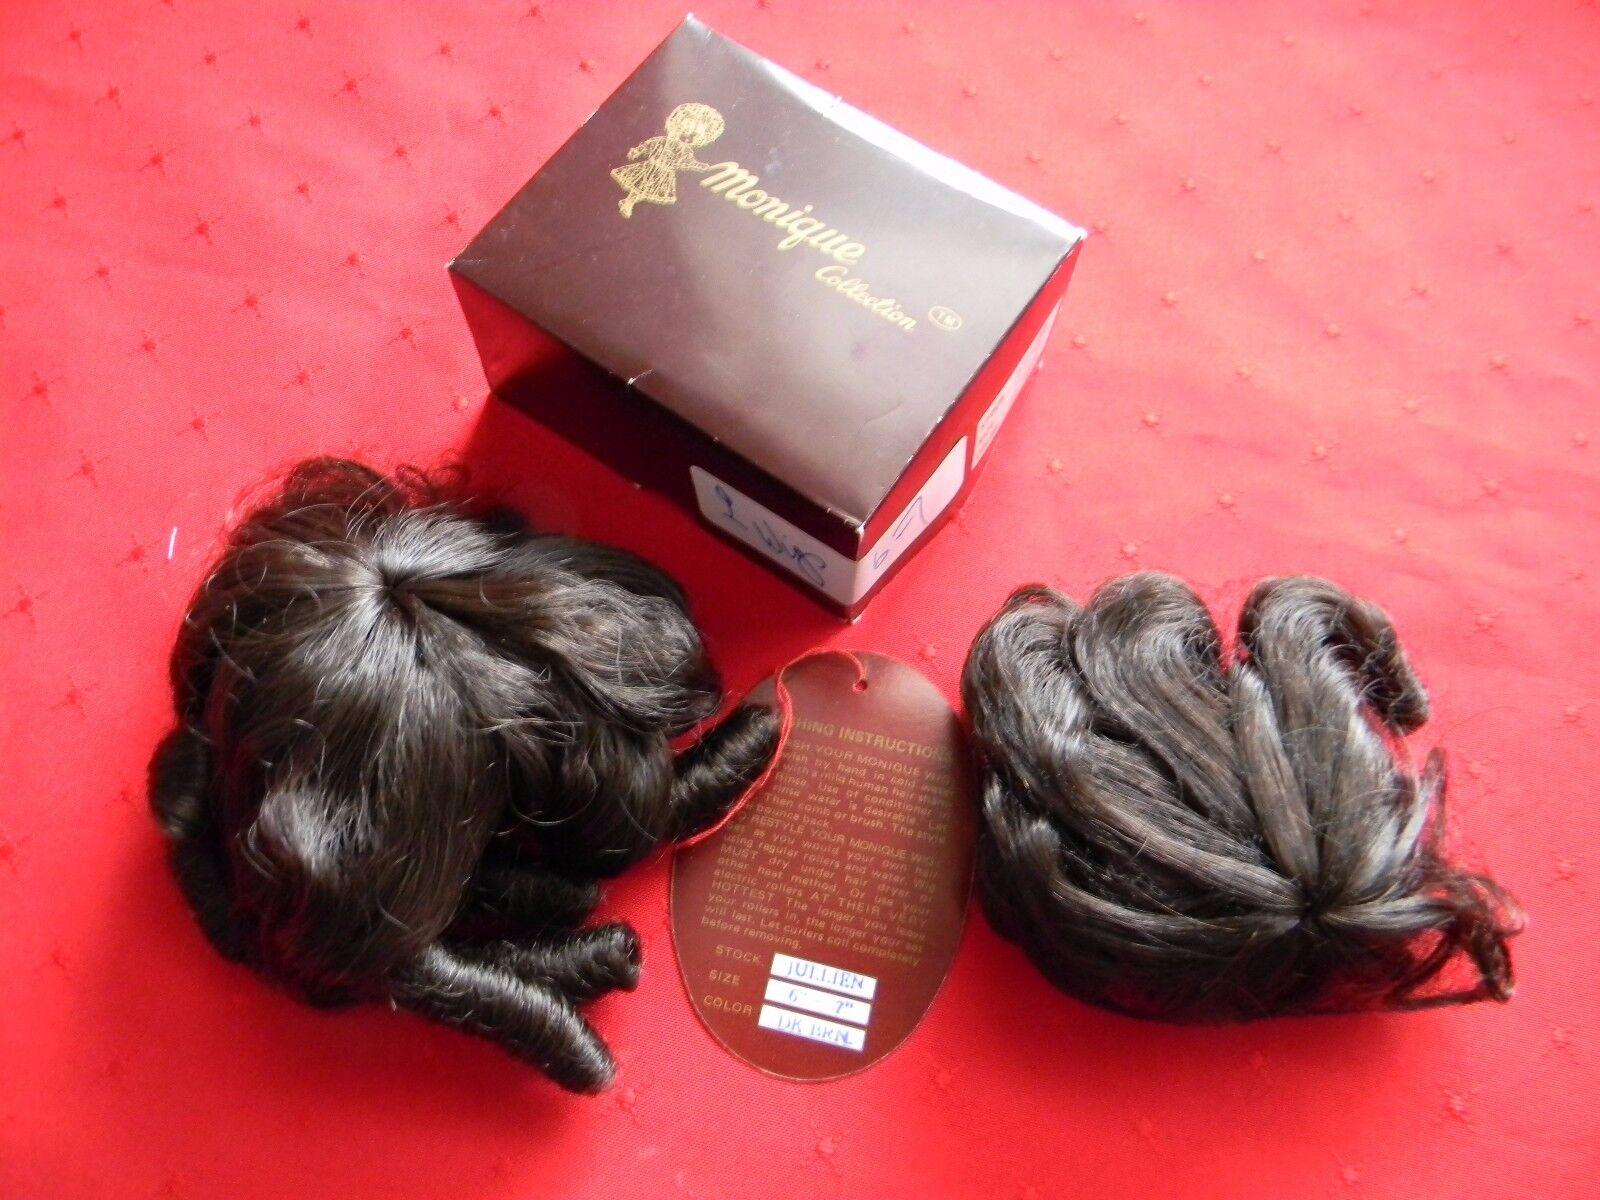 Monique Sammlung Puppe Perücken 2 X Julien 15.2cm-17.8cm 15.2cm-17.8cm 15.2cm-17.8cm Dunkelbraun Nos 261083